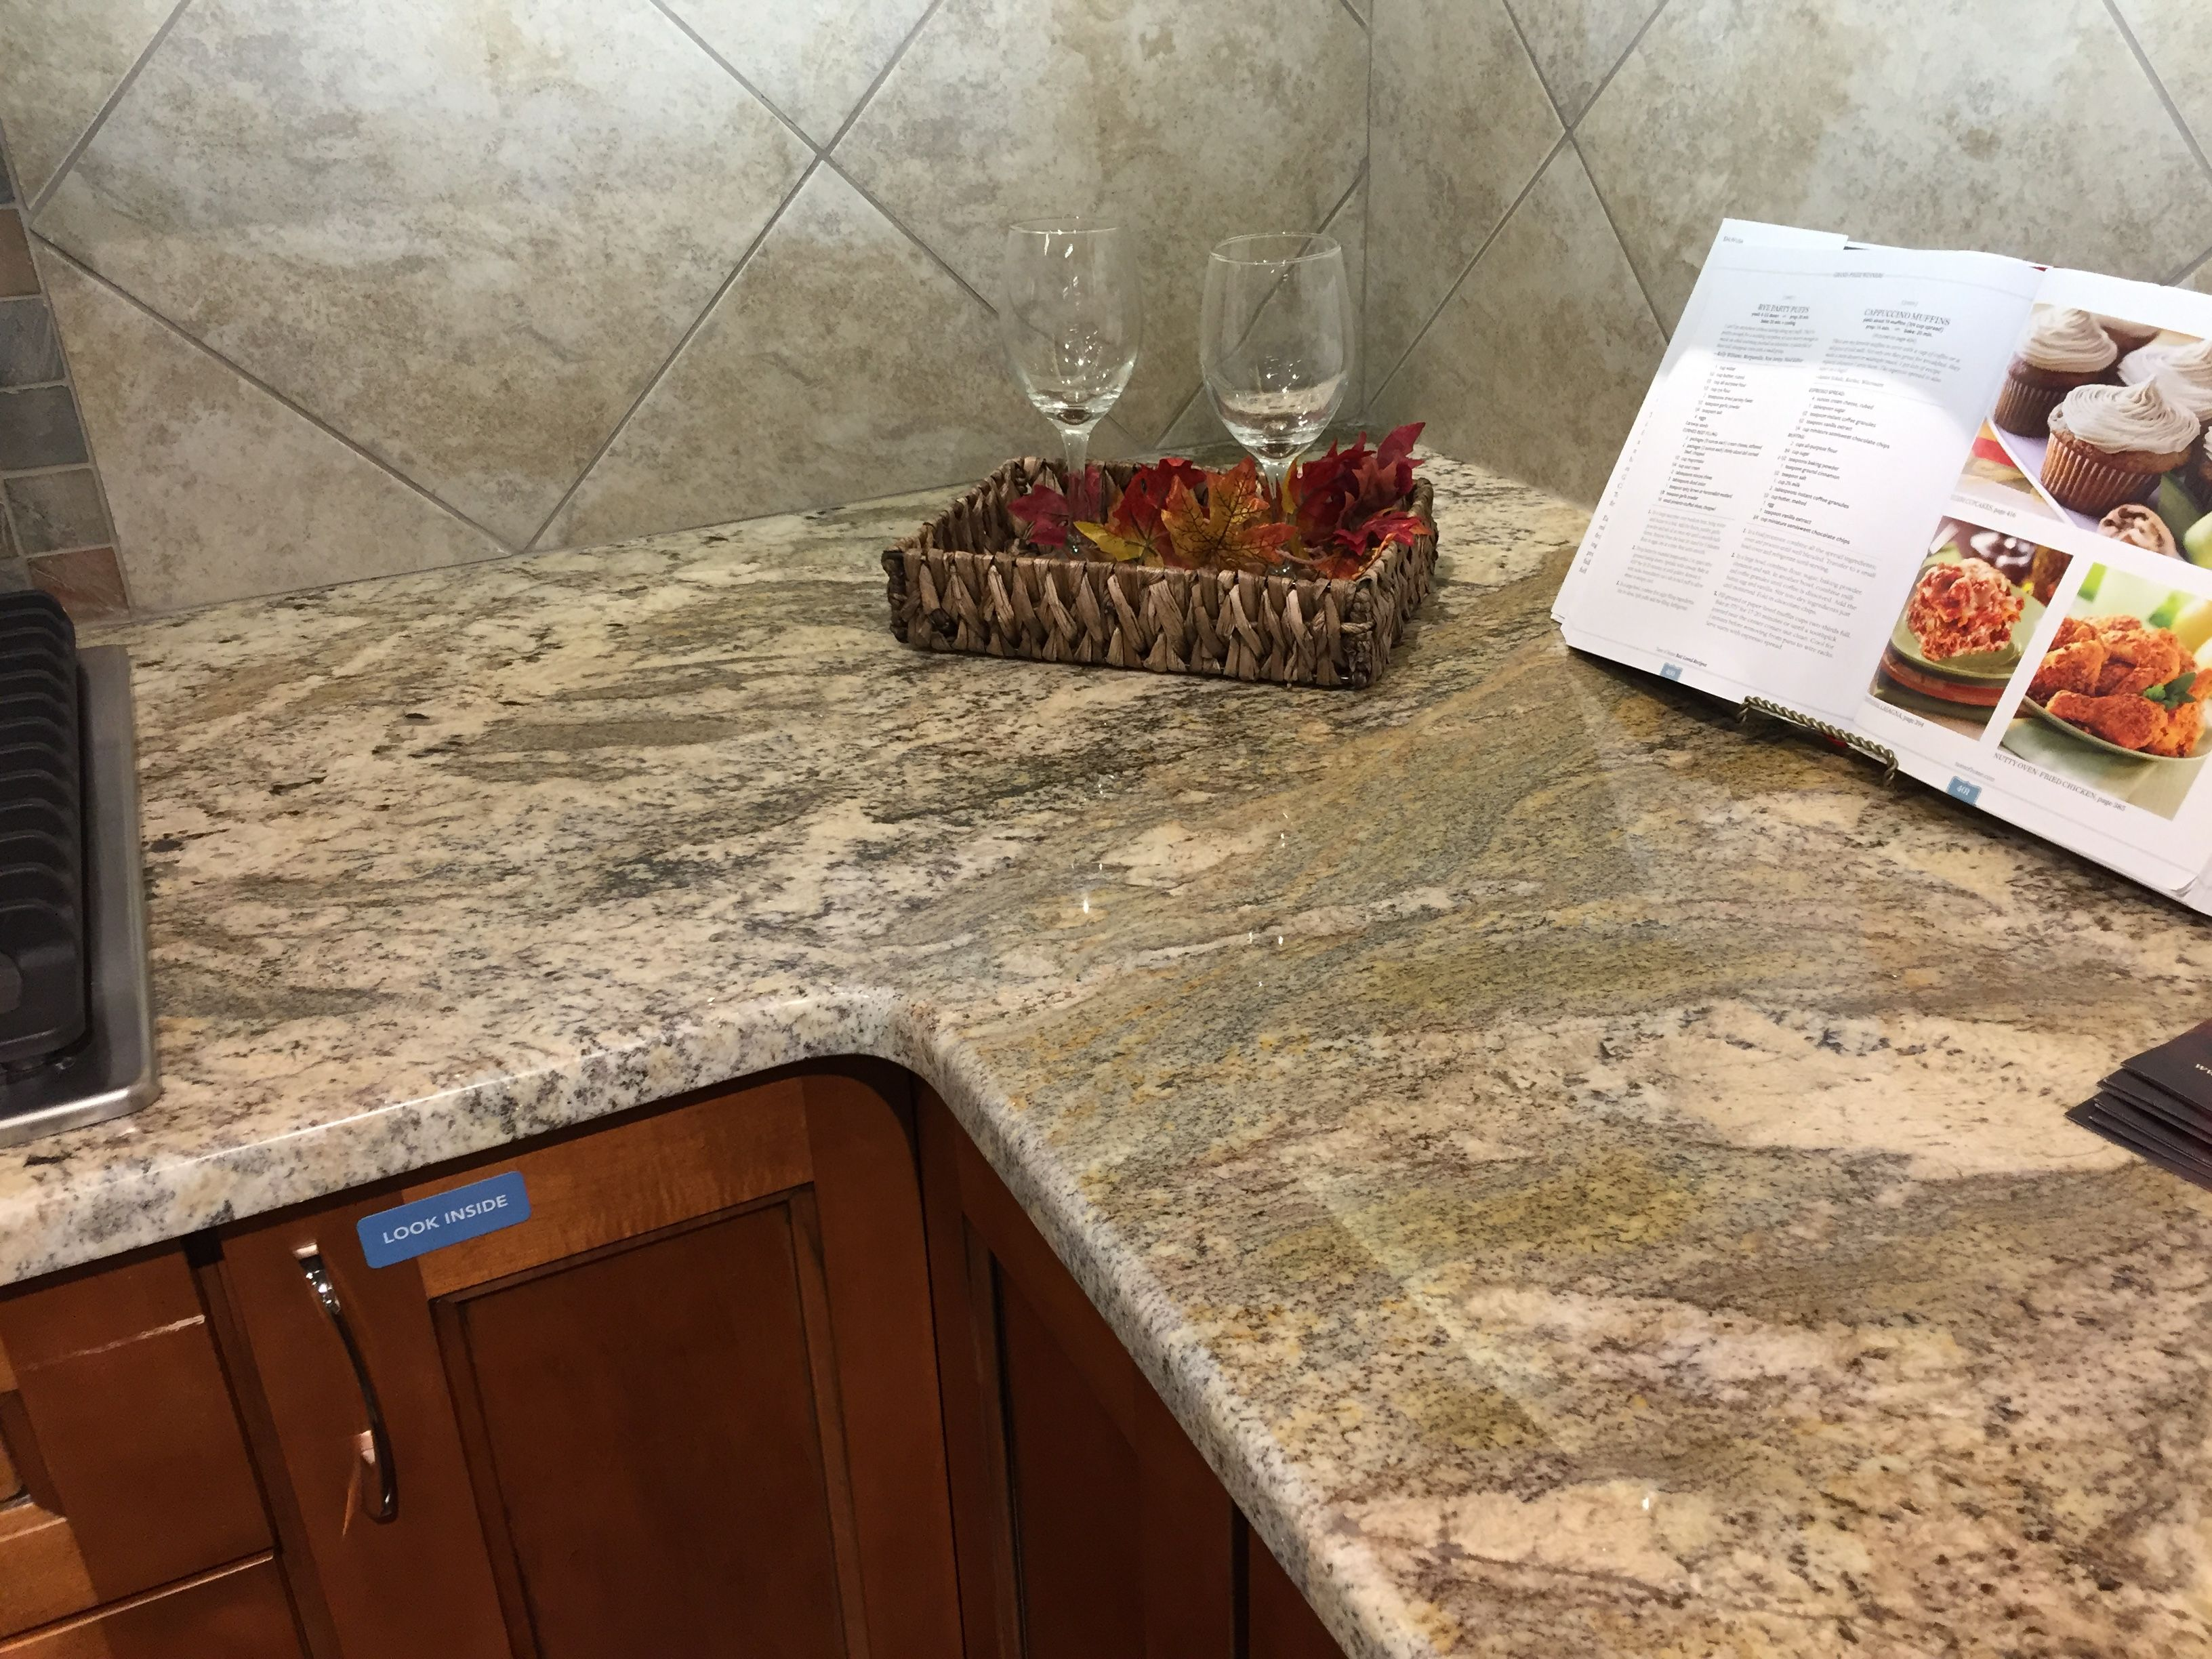 River Bordeaux Granite At Prosource In Albuquerque Cheap Home Decor Kitchen Countertops Kitchen Makeover